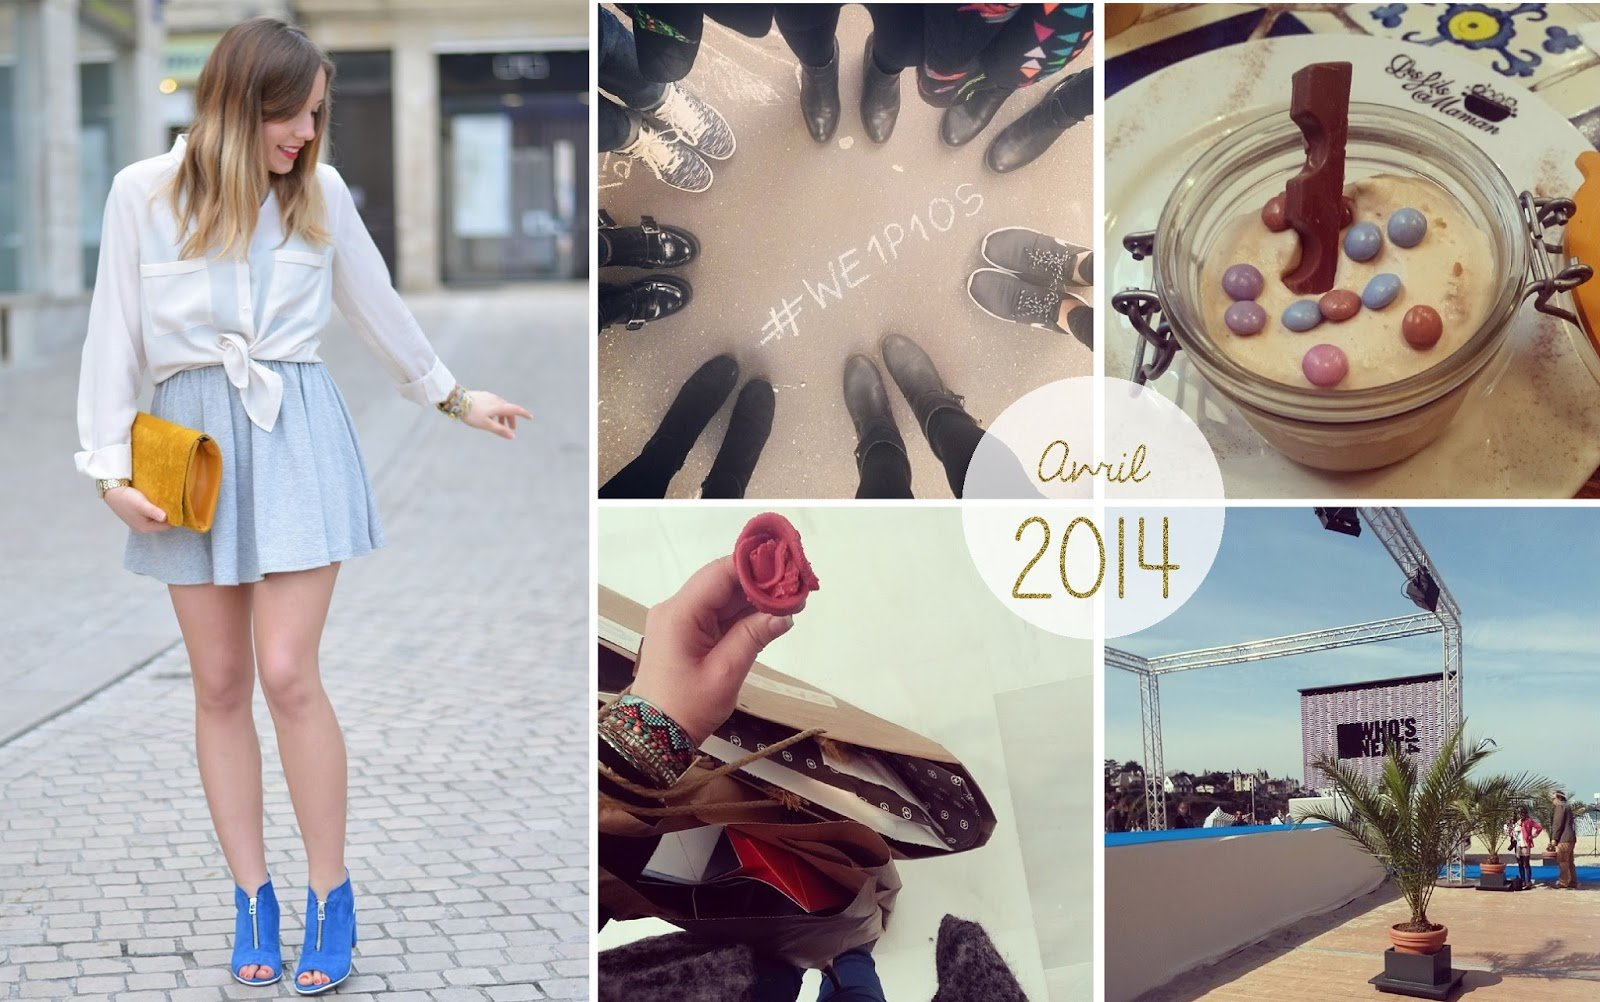 Avril 2014 Bonheur